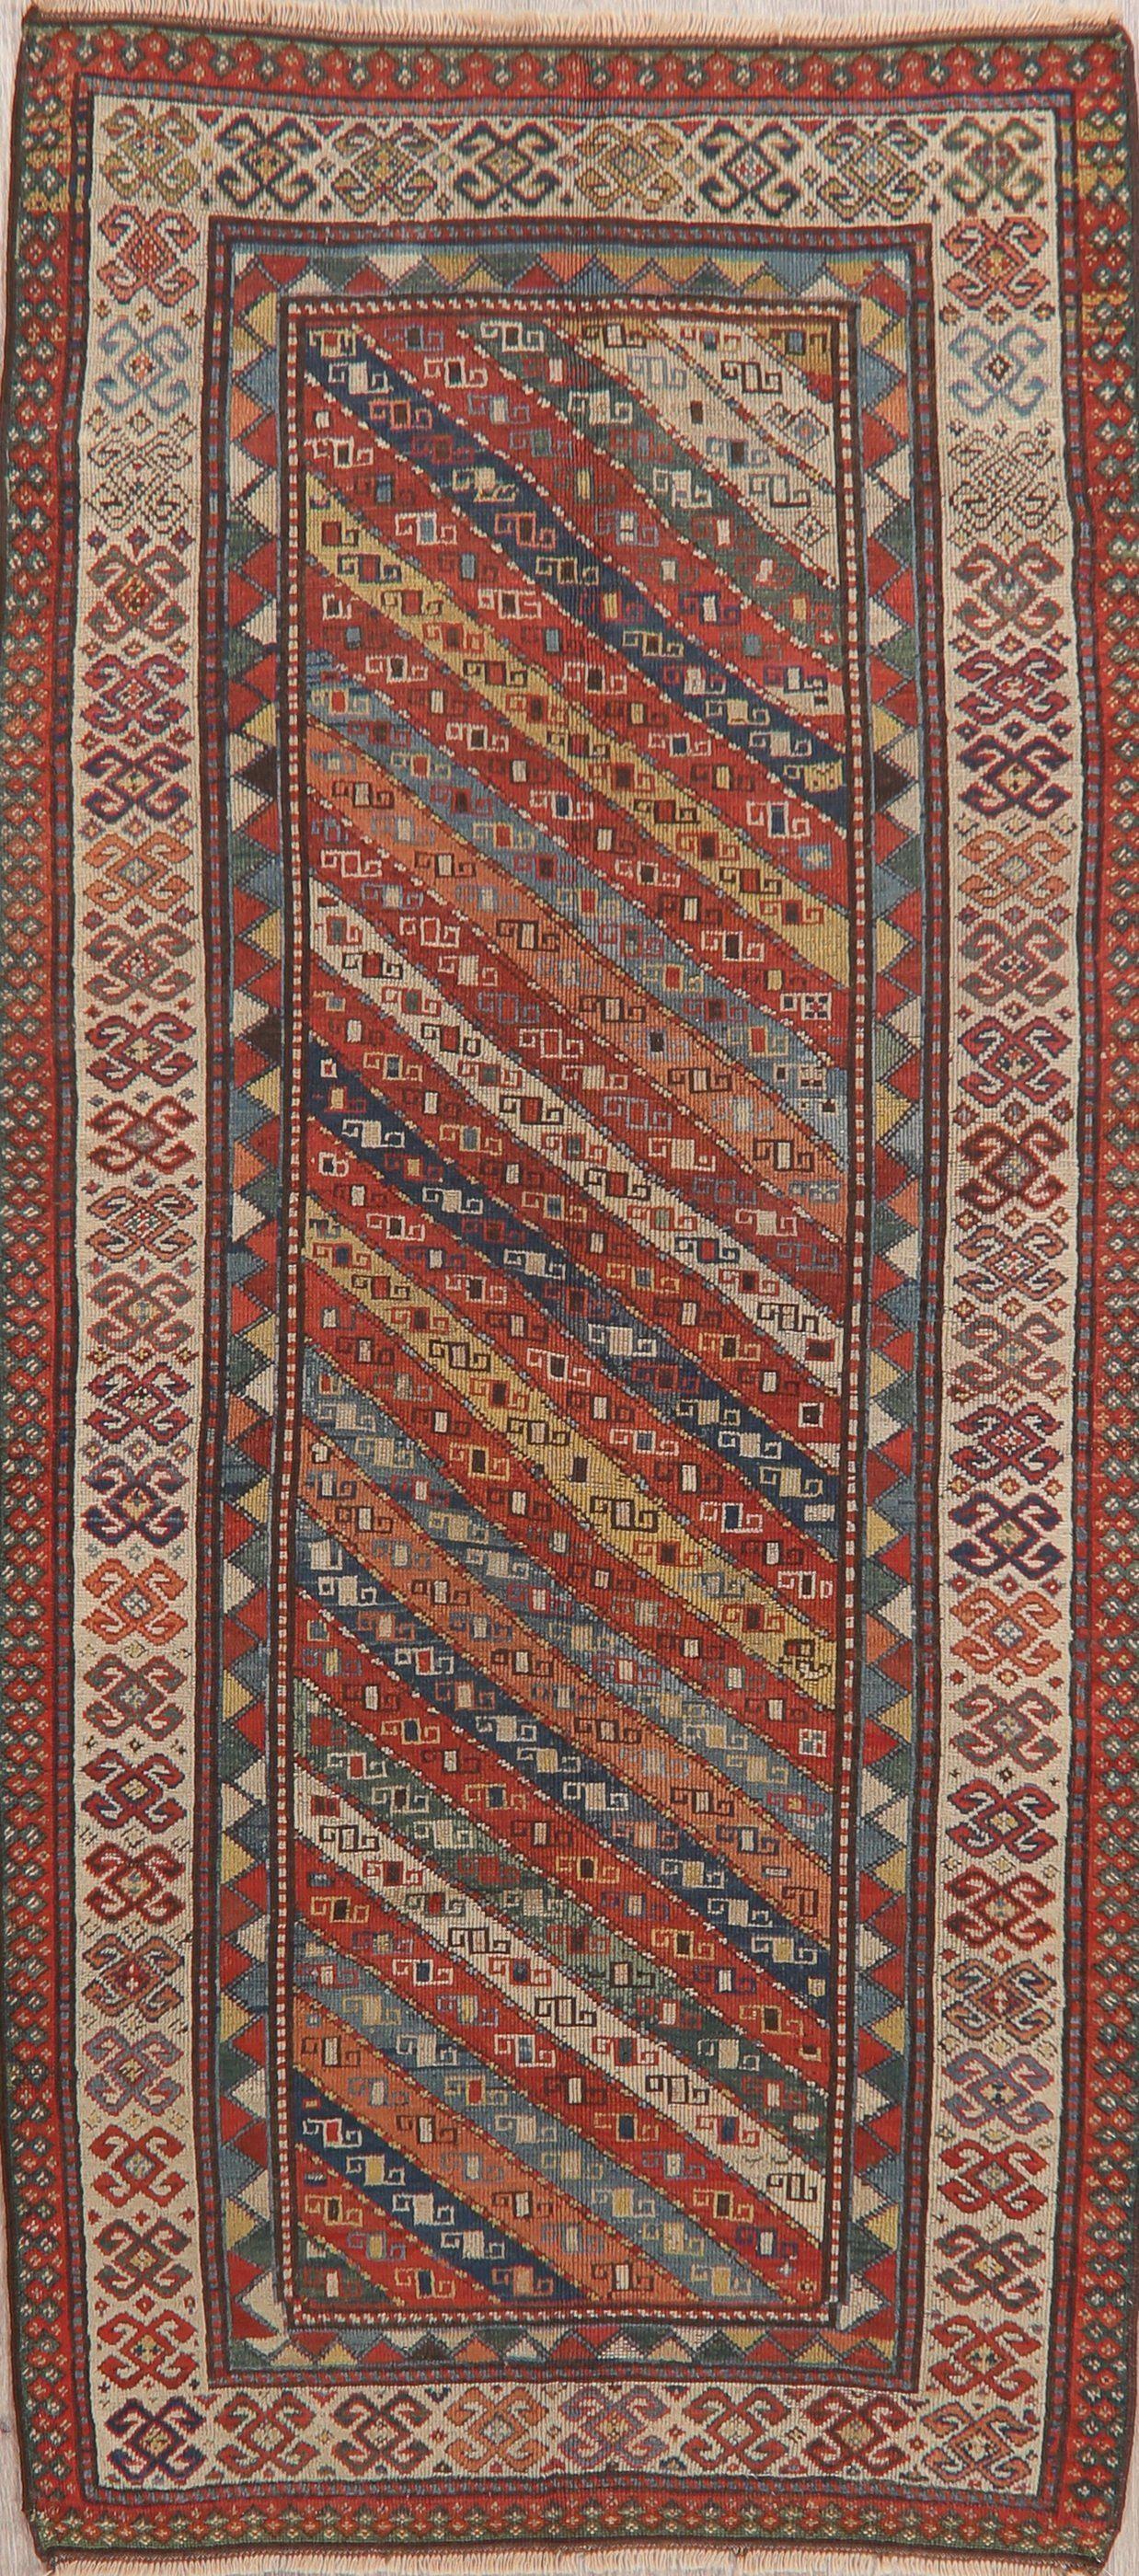 Pre-1900 Antique Vegetable Dye Kazak Caucasian Oriental